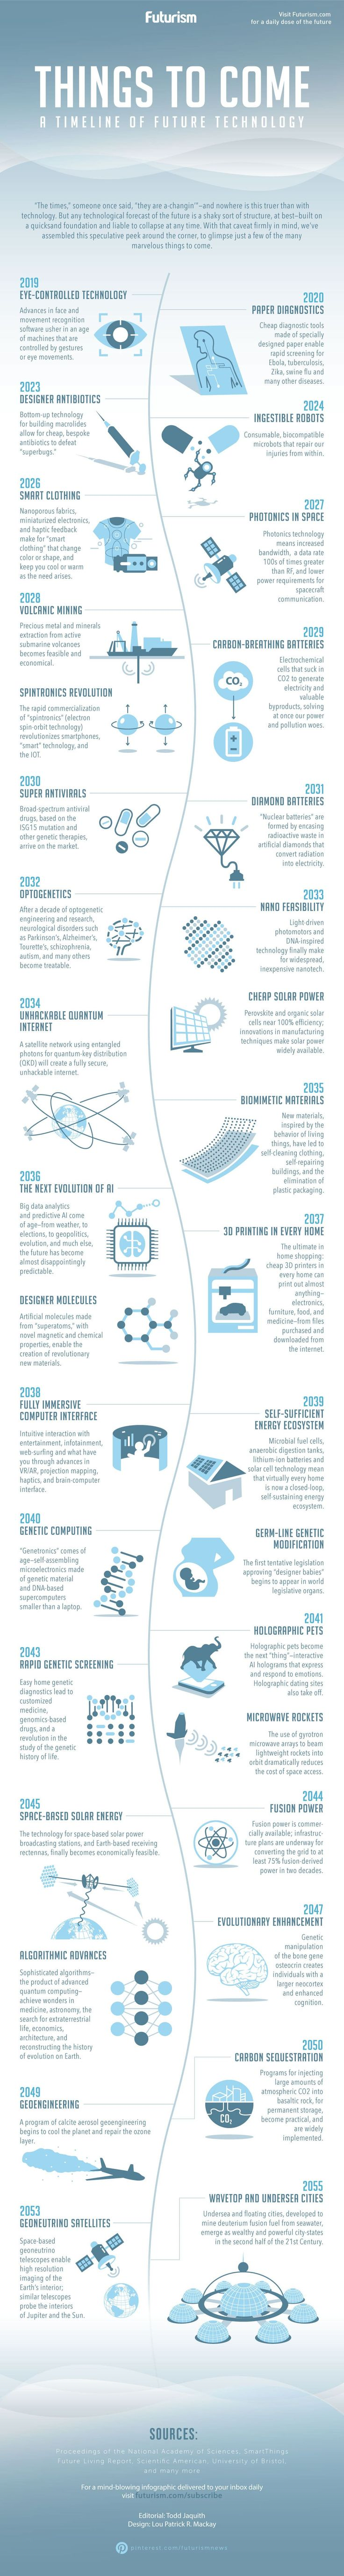 http://uk.businessinsider.com/future-technologies-infographic-2017-7?utm_content=bufferaefc9